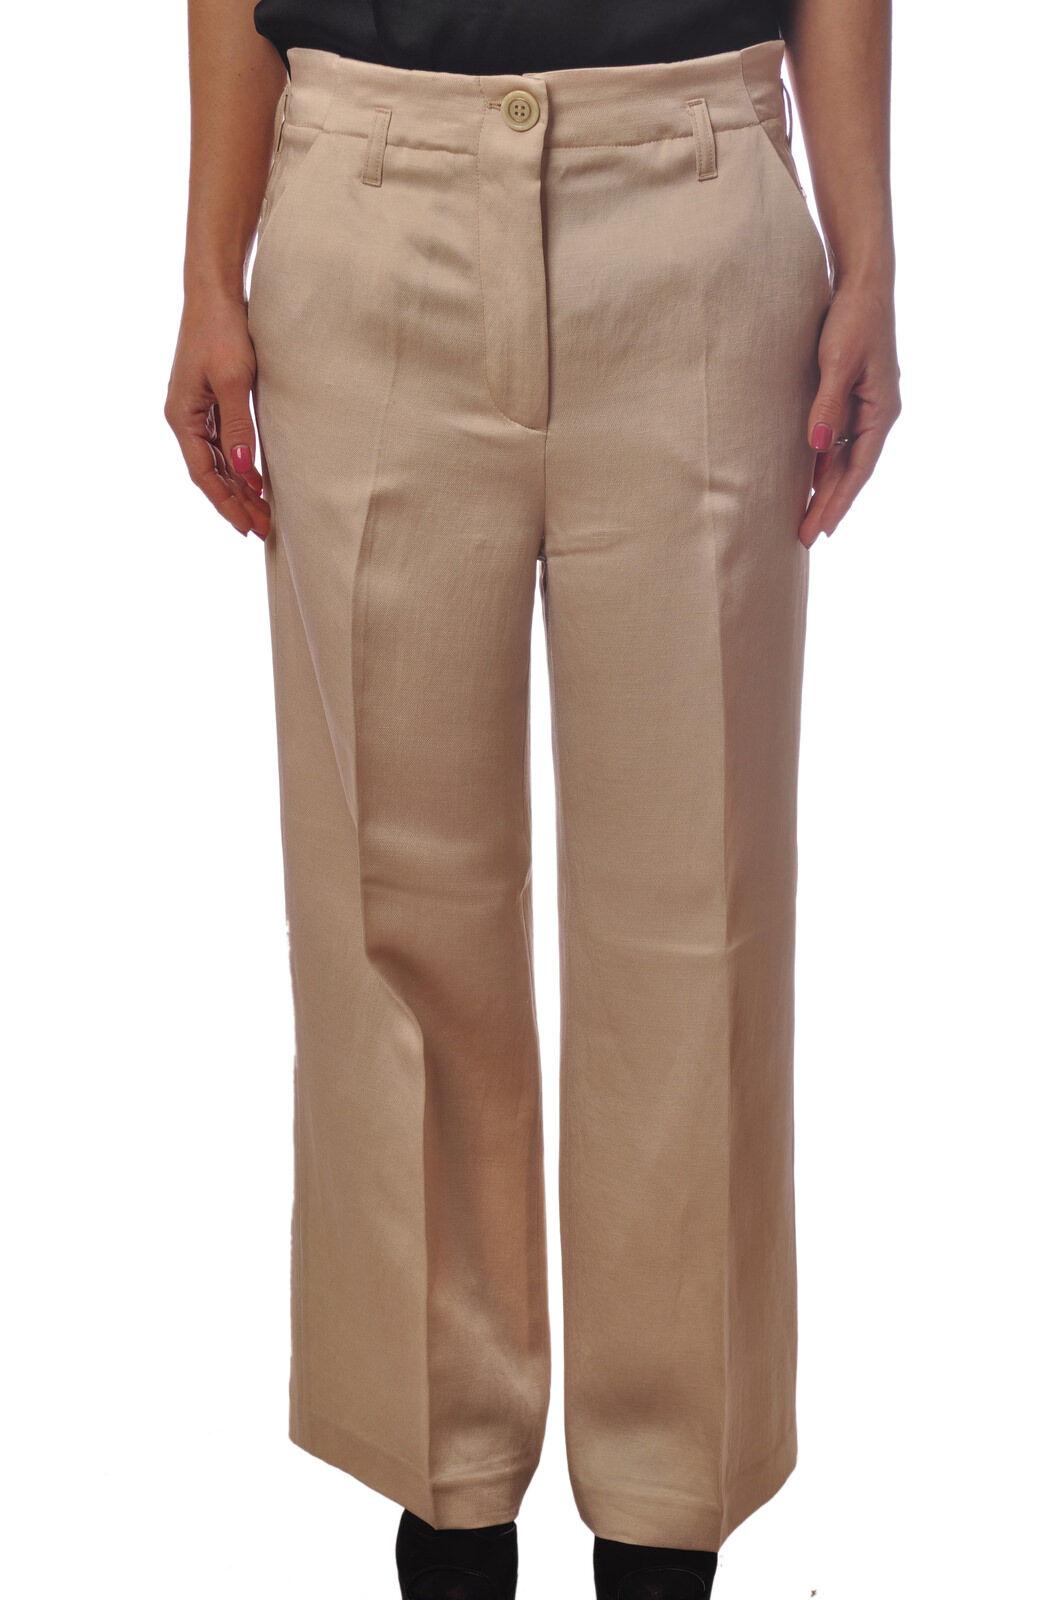 Twin Set - Pantaloni-Pantaloni - mujer - Beige - 5131505G181635   la mejor oferta de tienda online